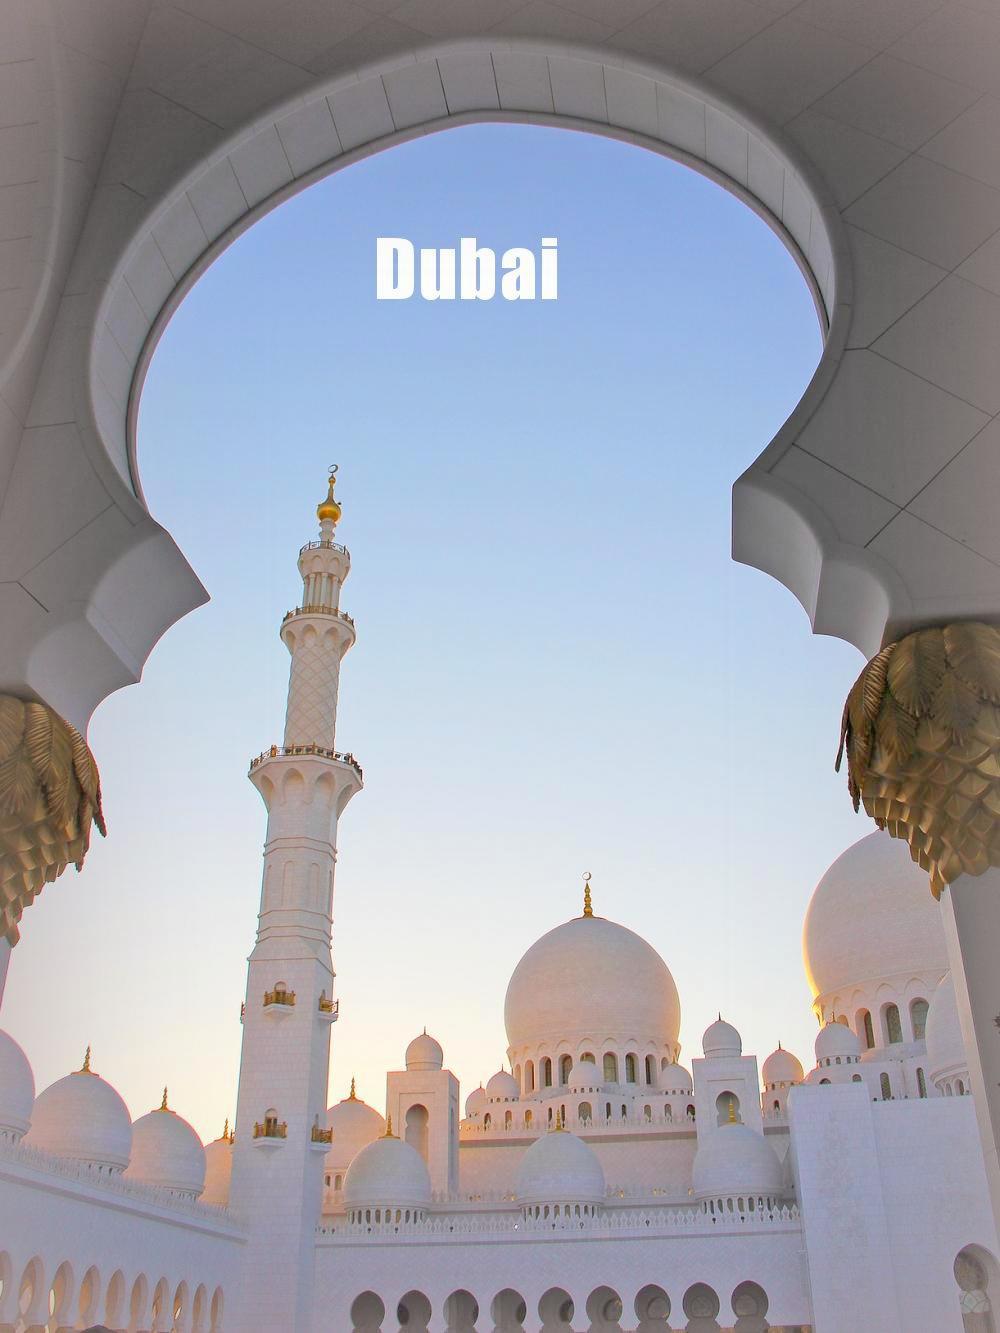 Foto: Dubai / Arabien Reise